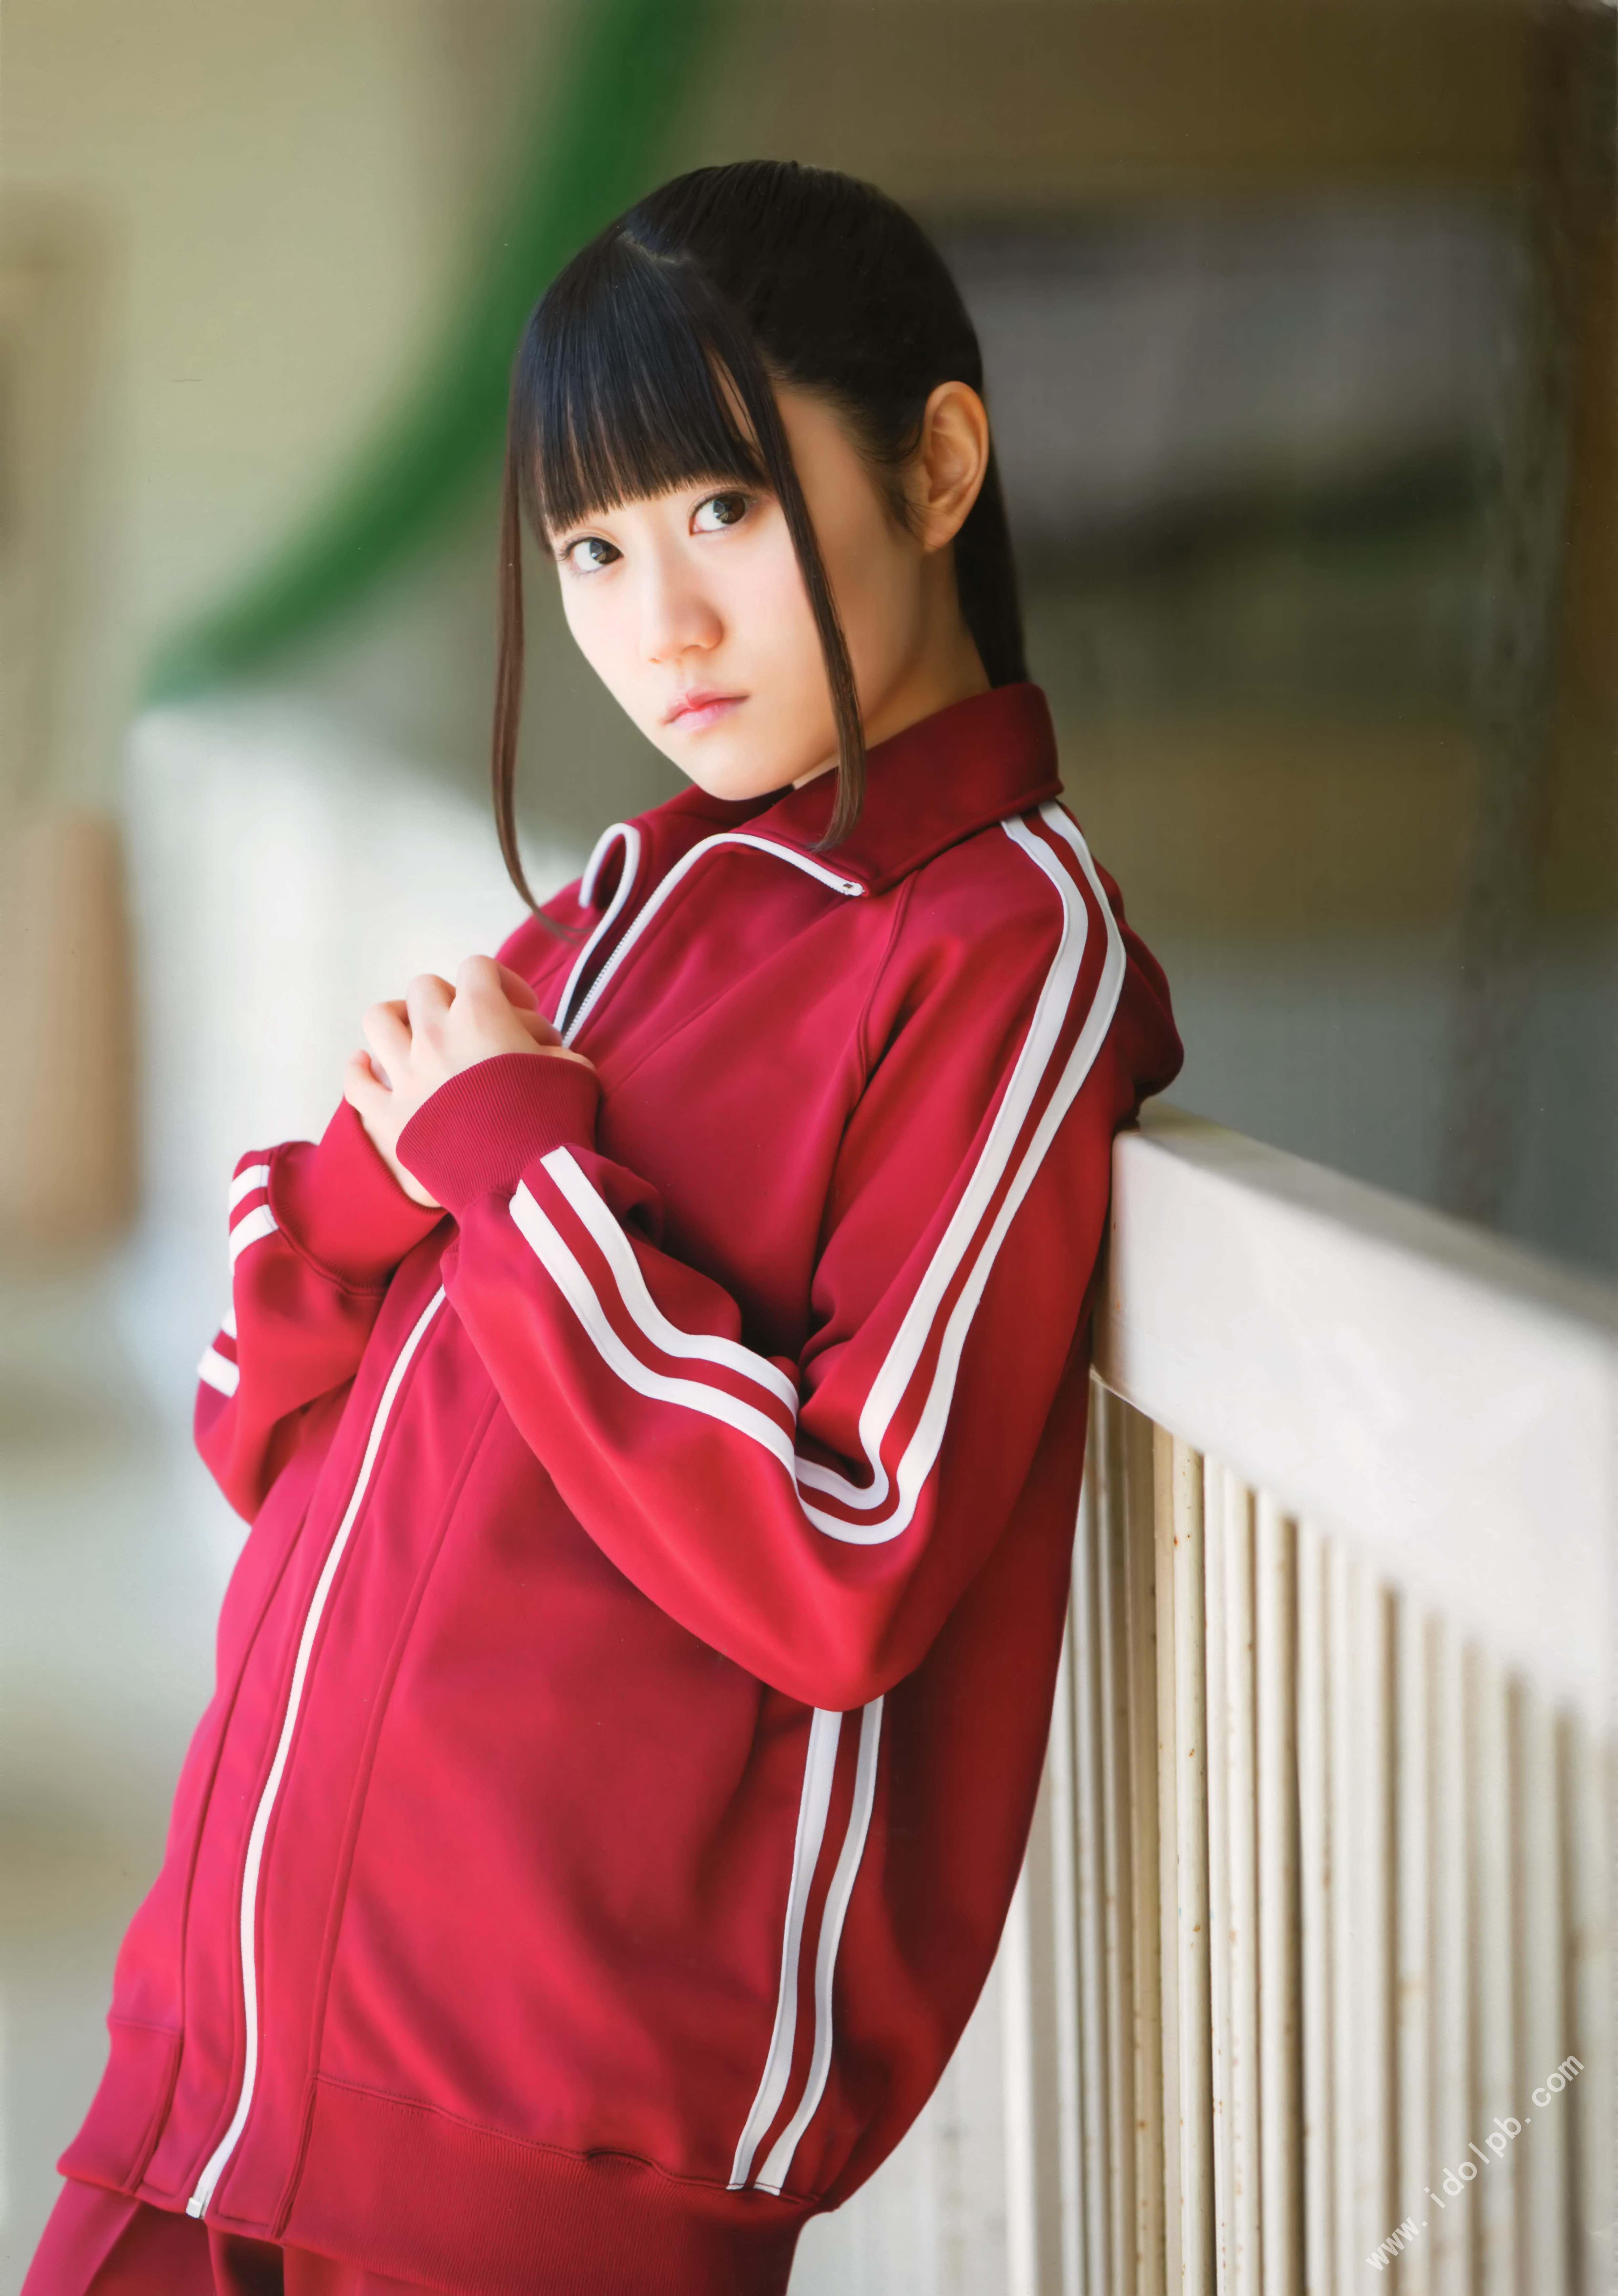 ogura_yui082.jpg